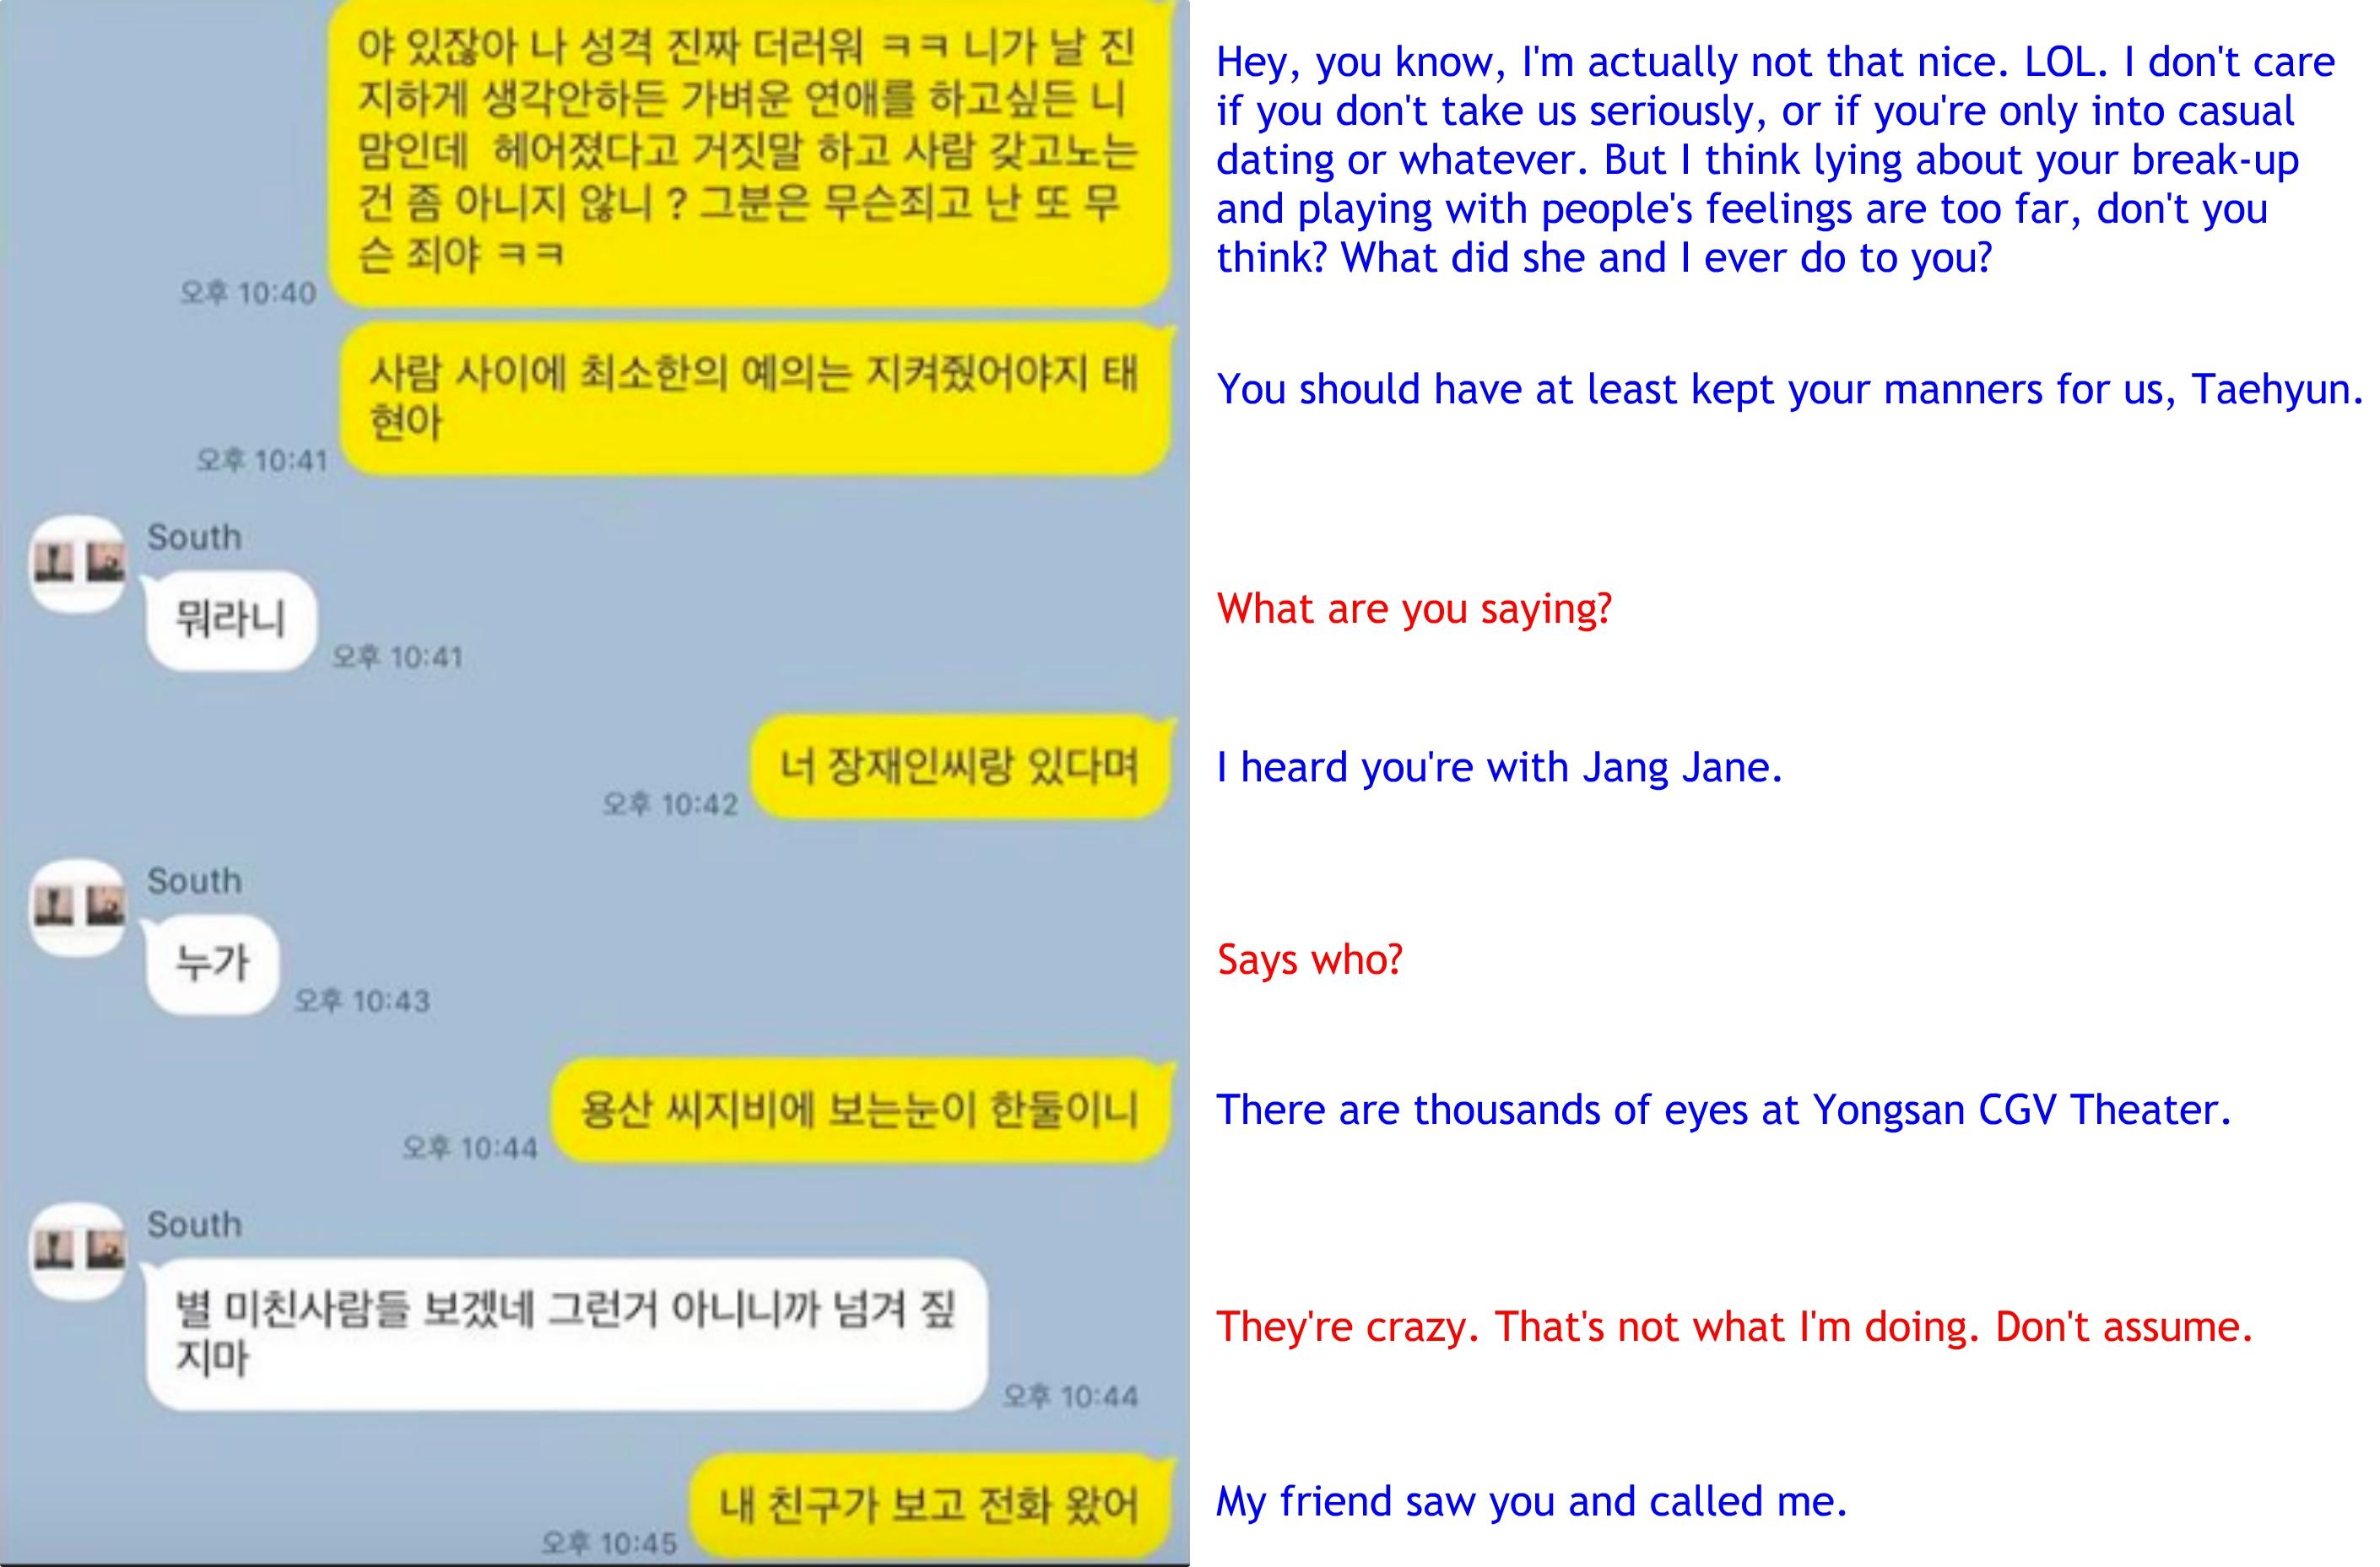 Jang Jae In exposes Nam Tae Hyun for cheating, he admits